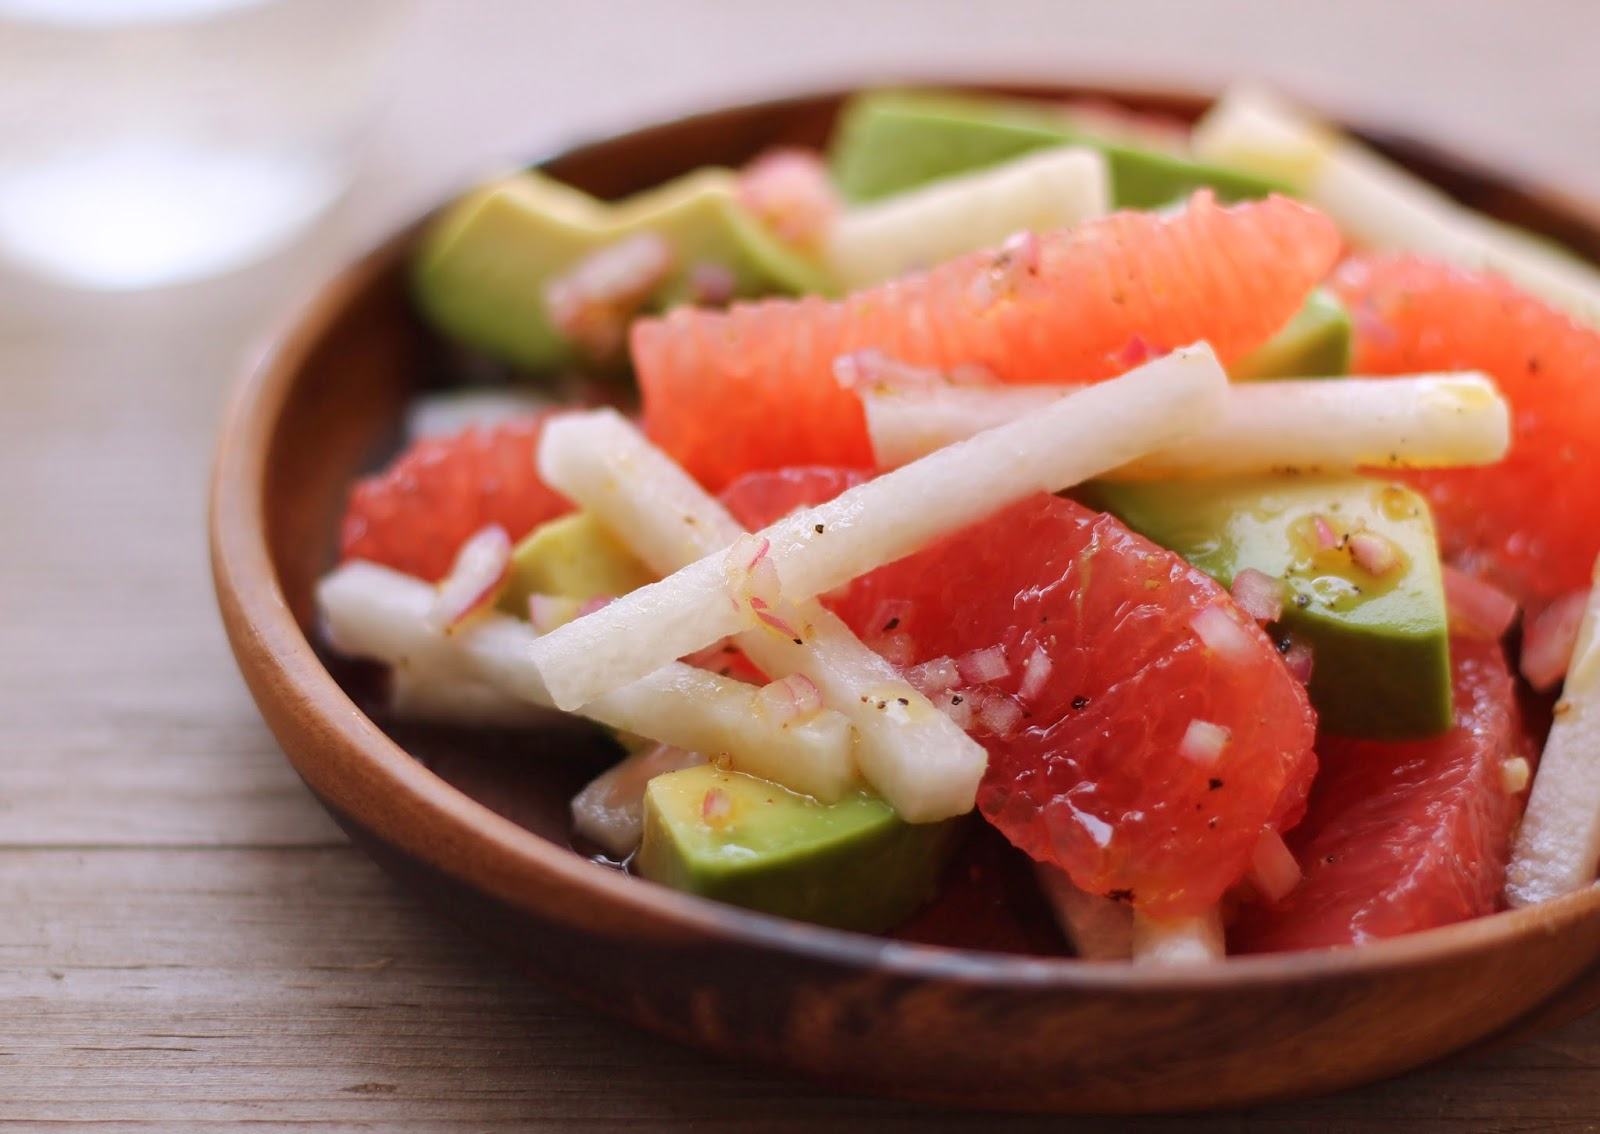 Ruby red grapefruit, avocado & jicama salad   lieslicious